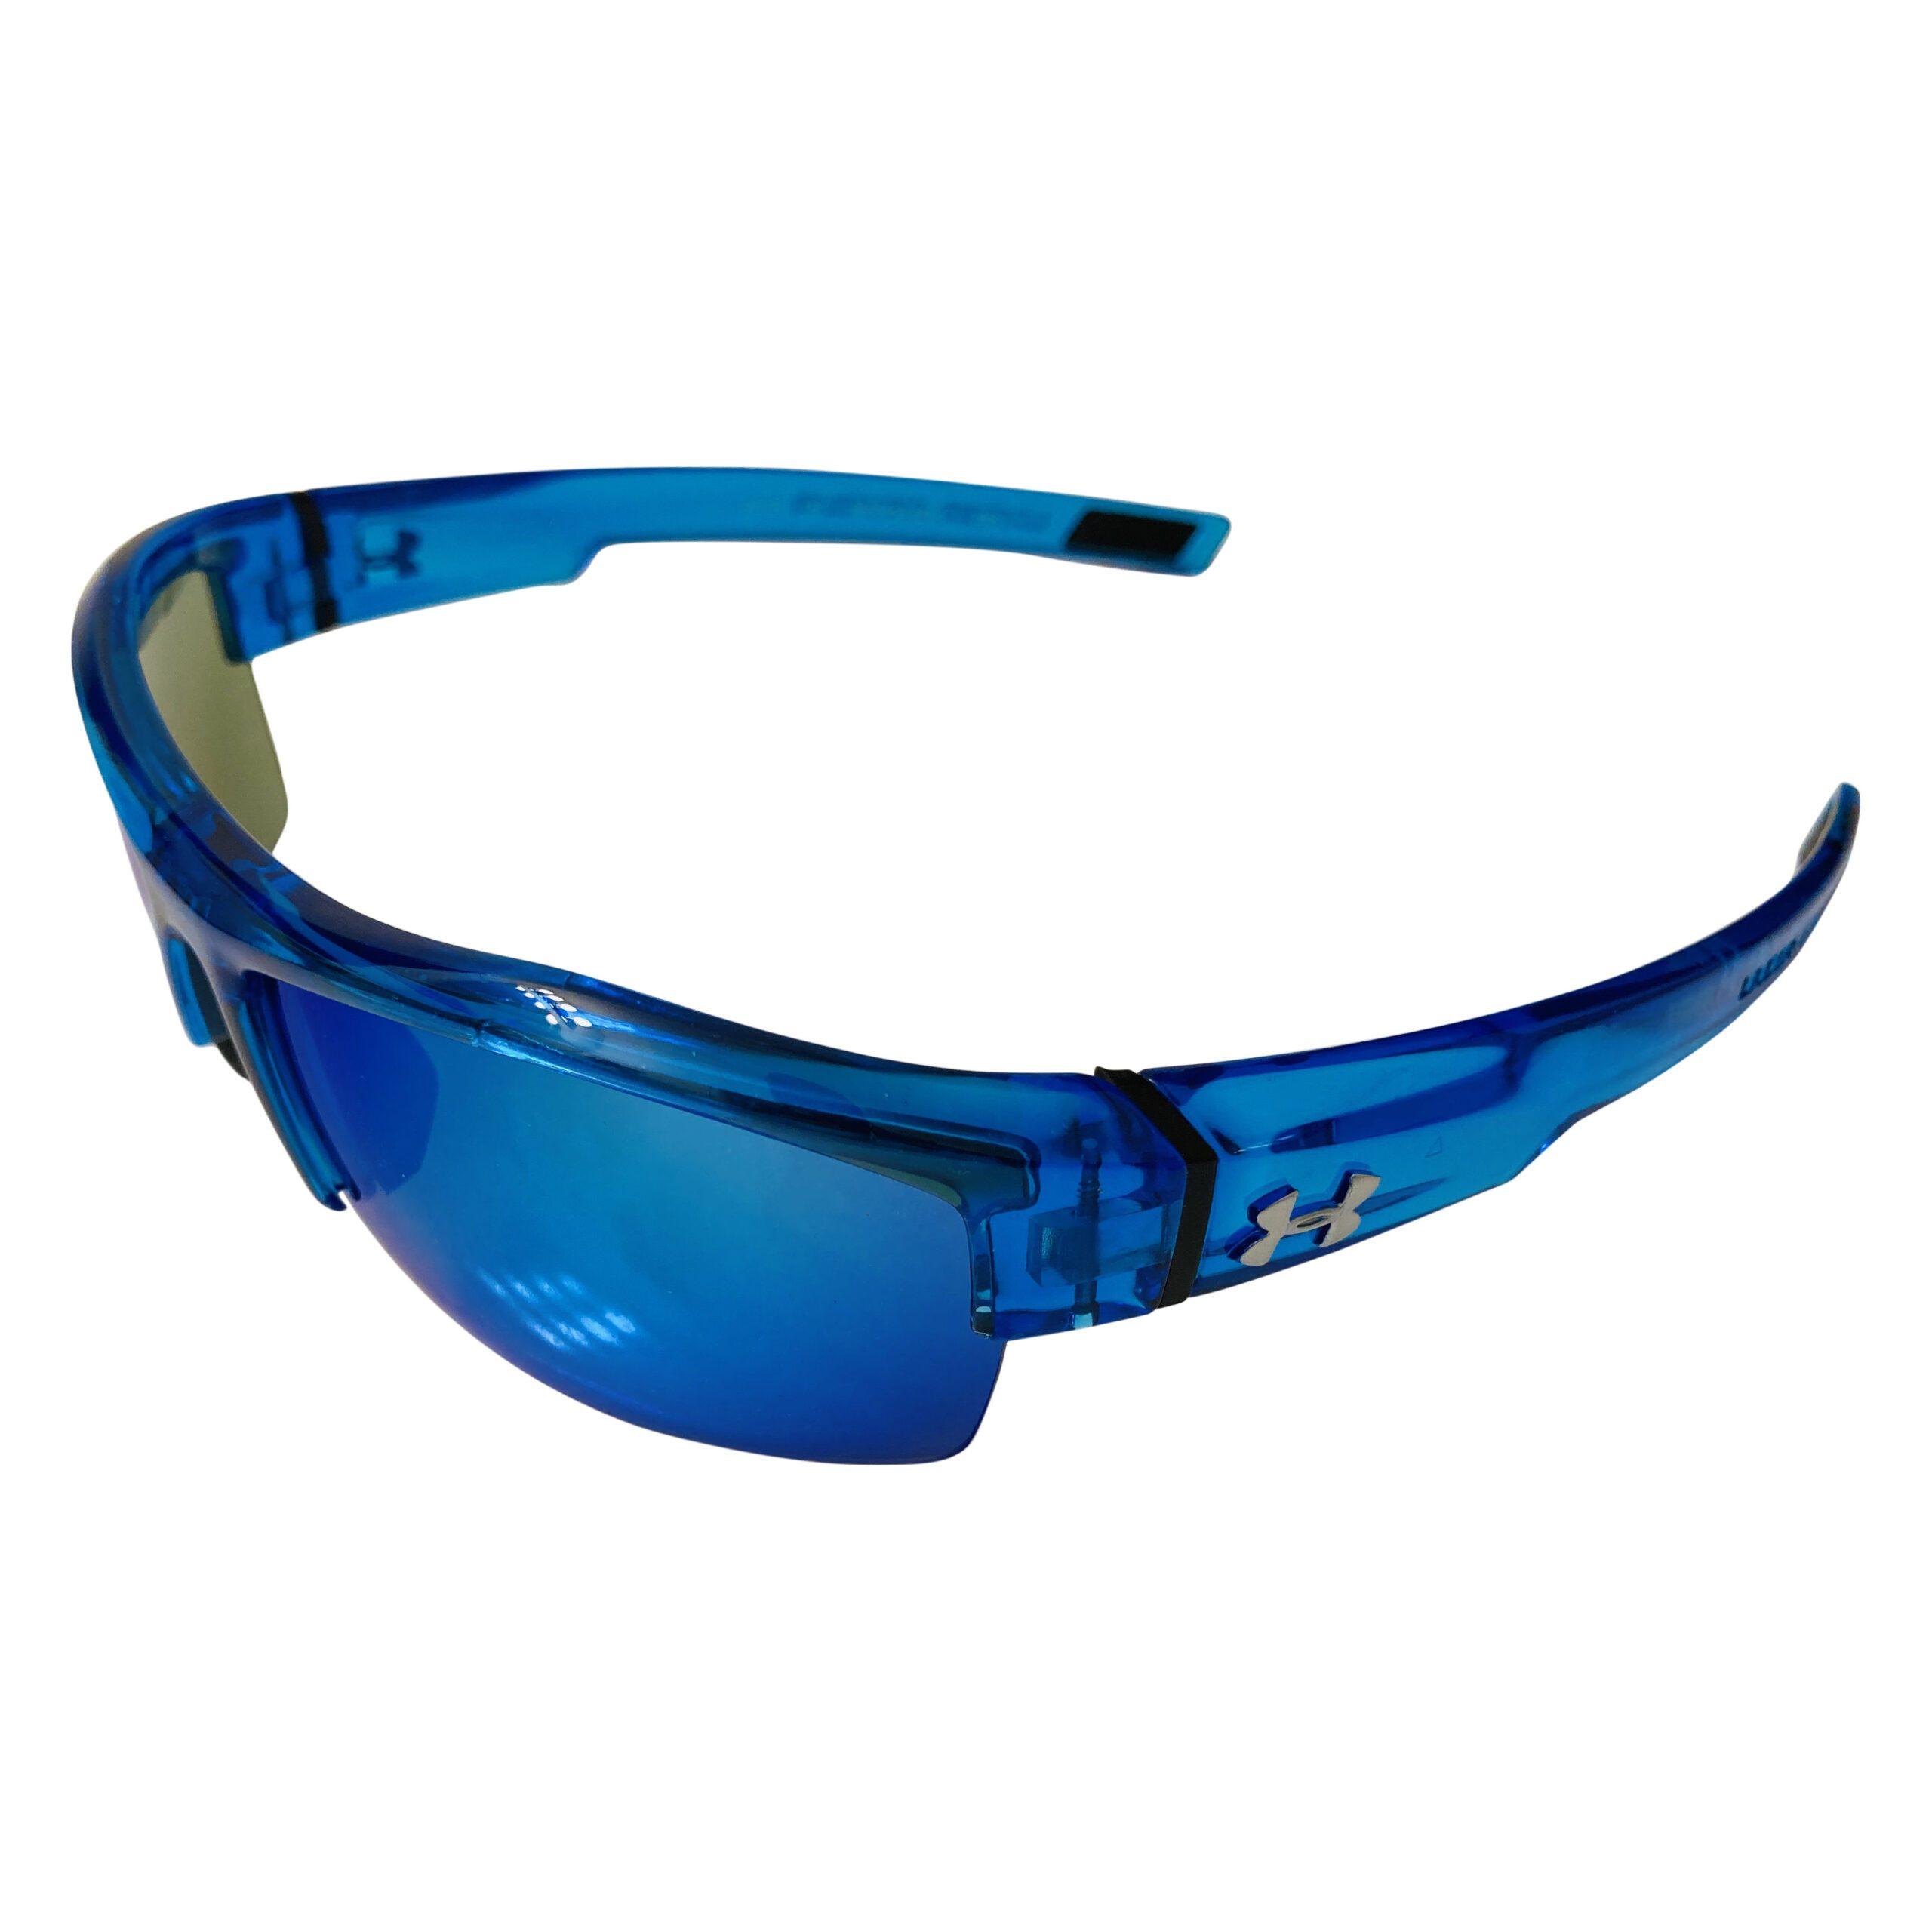 Under Armour Igniter Sunglasses UA - Crystal Blue - Blue Multiflection Lens